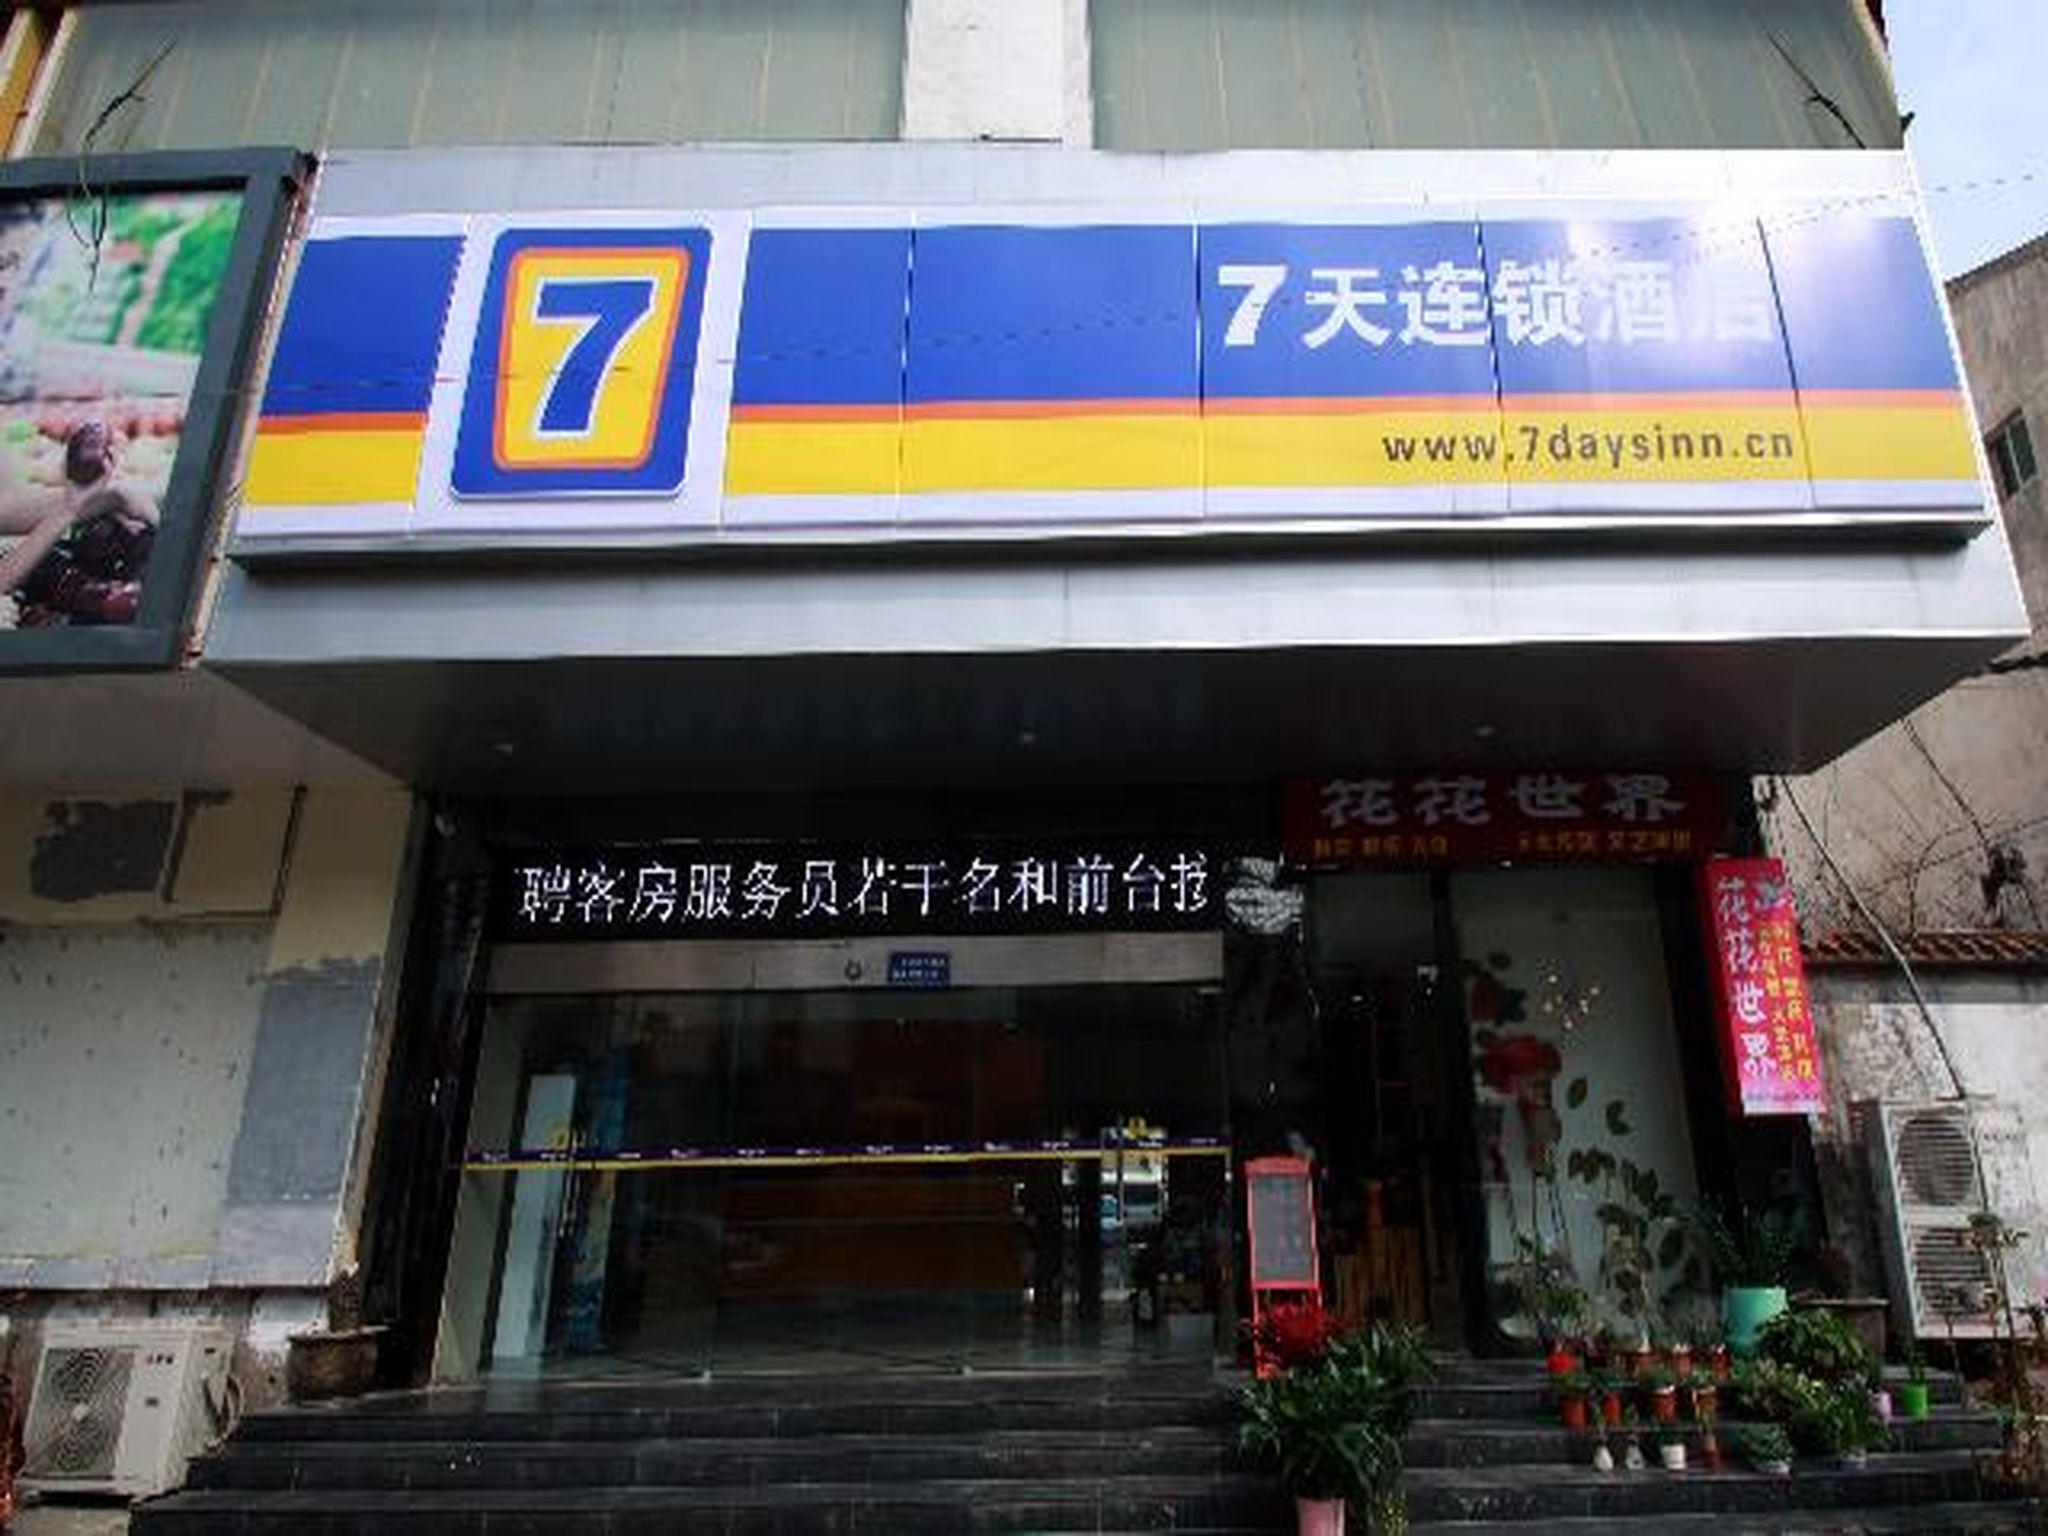 7 Days Inn Suzhou Yang Cheng Lake Subway Station Branch